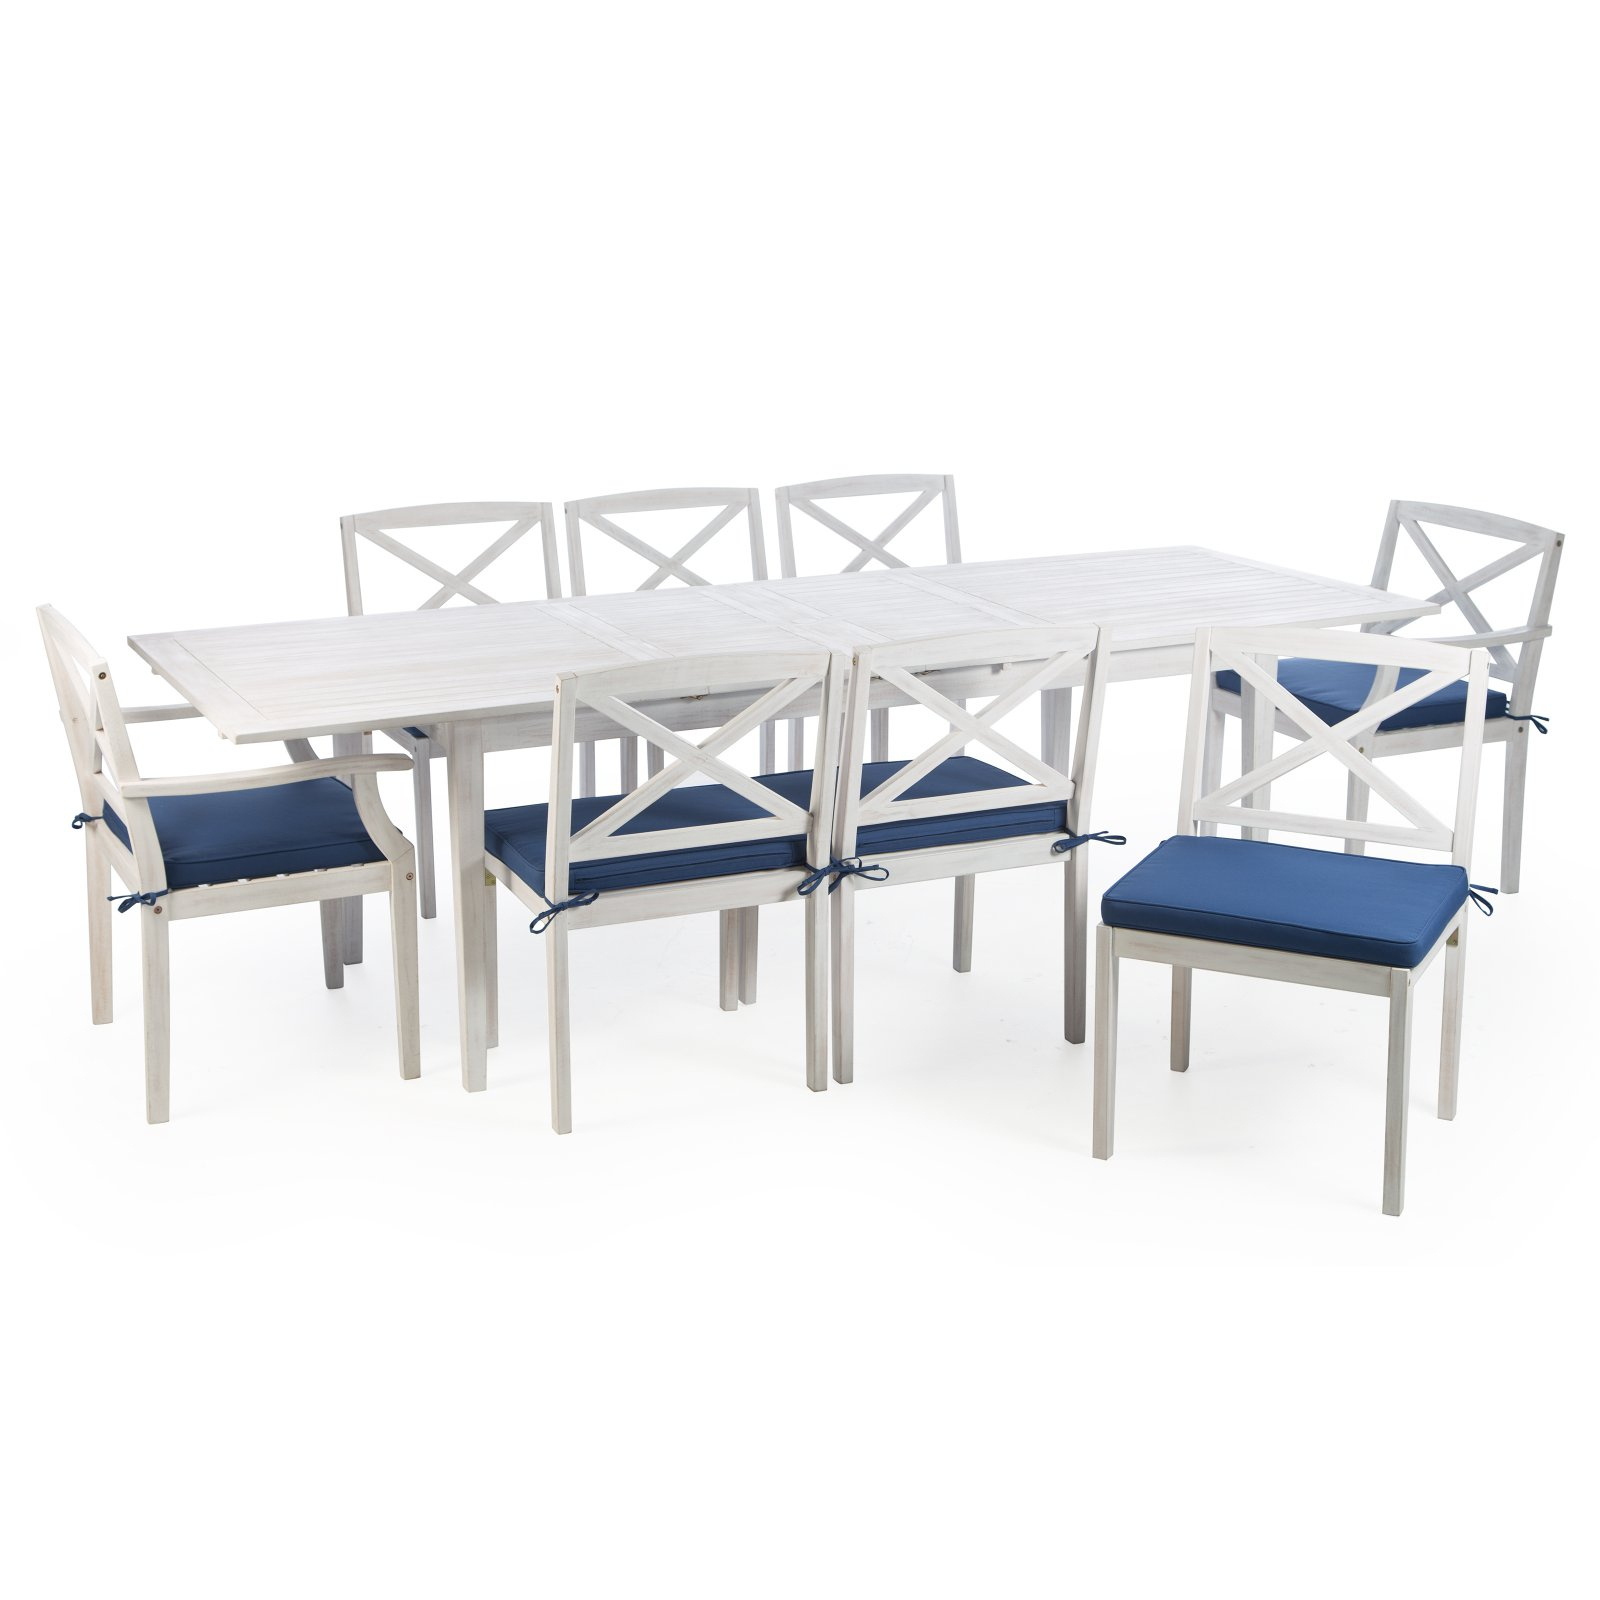 Favorite Ebern Designs Tarleton 5 Piece Dining Set – Walmart Pertaining To Tarleton 5 Piece Dining Sets (Gallery 19 of 20)